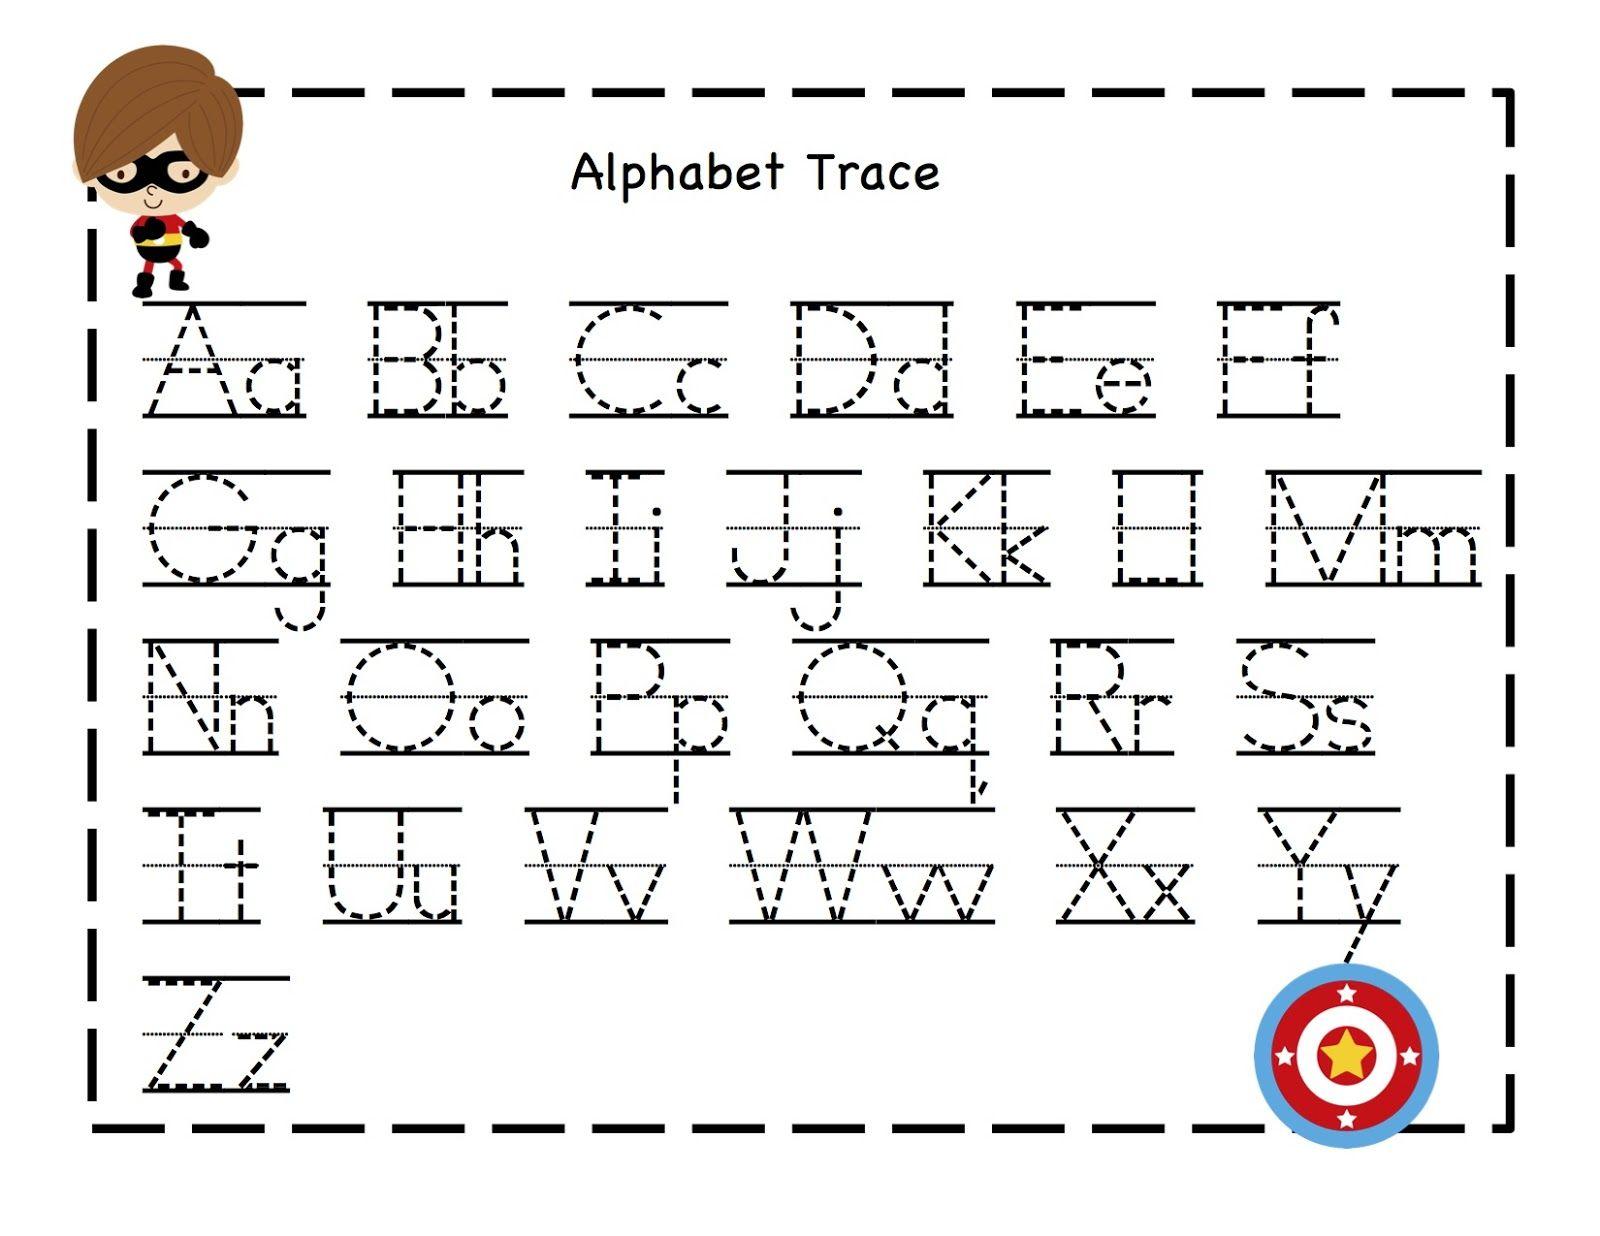 Abc Tracing Sheets For Preschool Kids | Alphabet Preschool